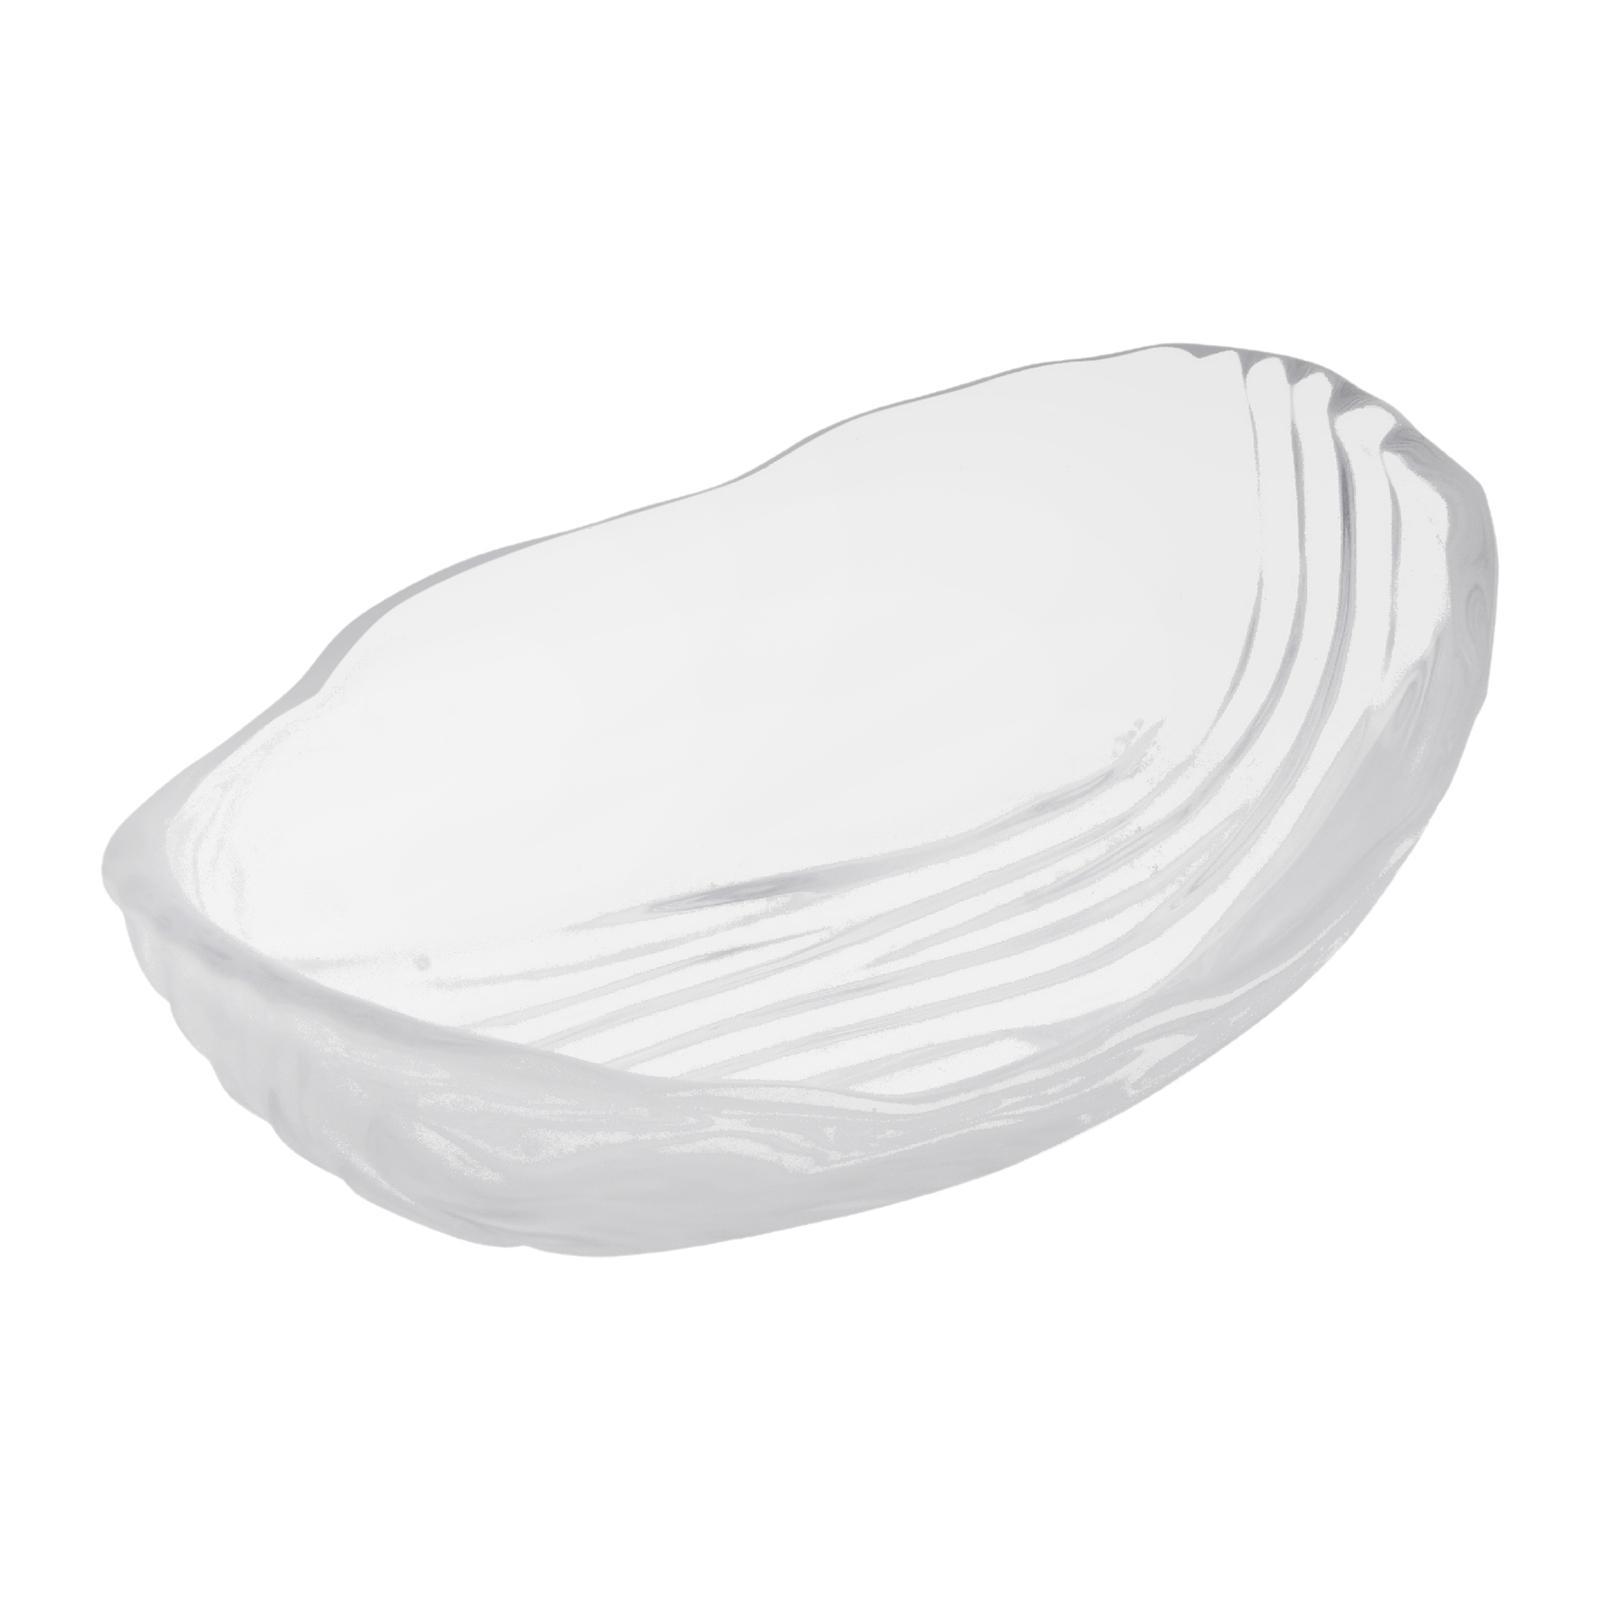 Soga KMGW Deep Oval Glass Dish 15 CM 3-PCS Set